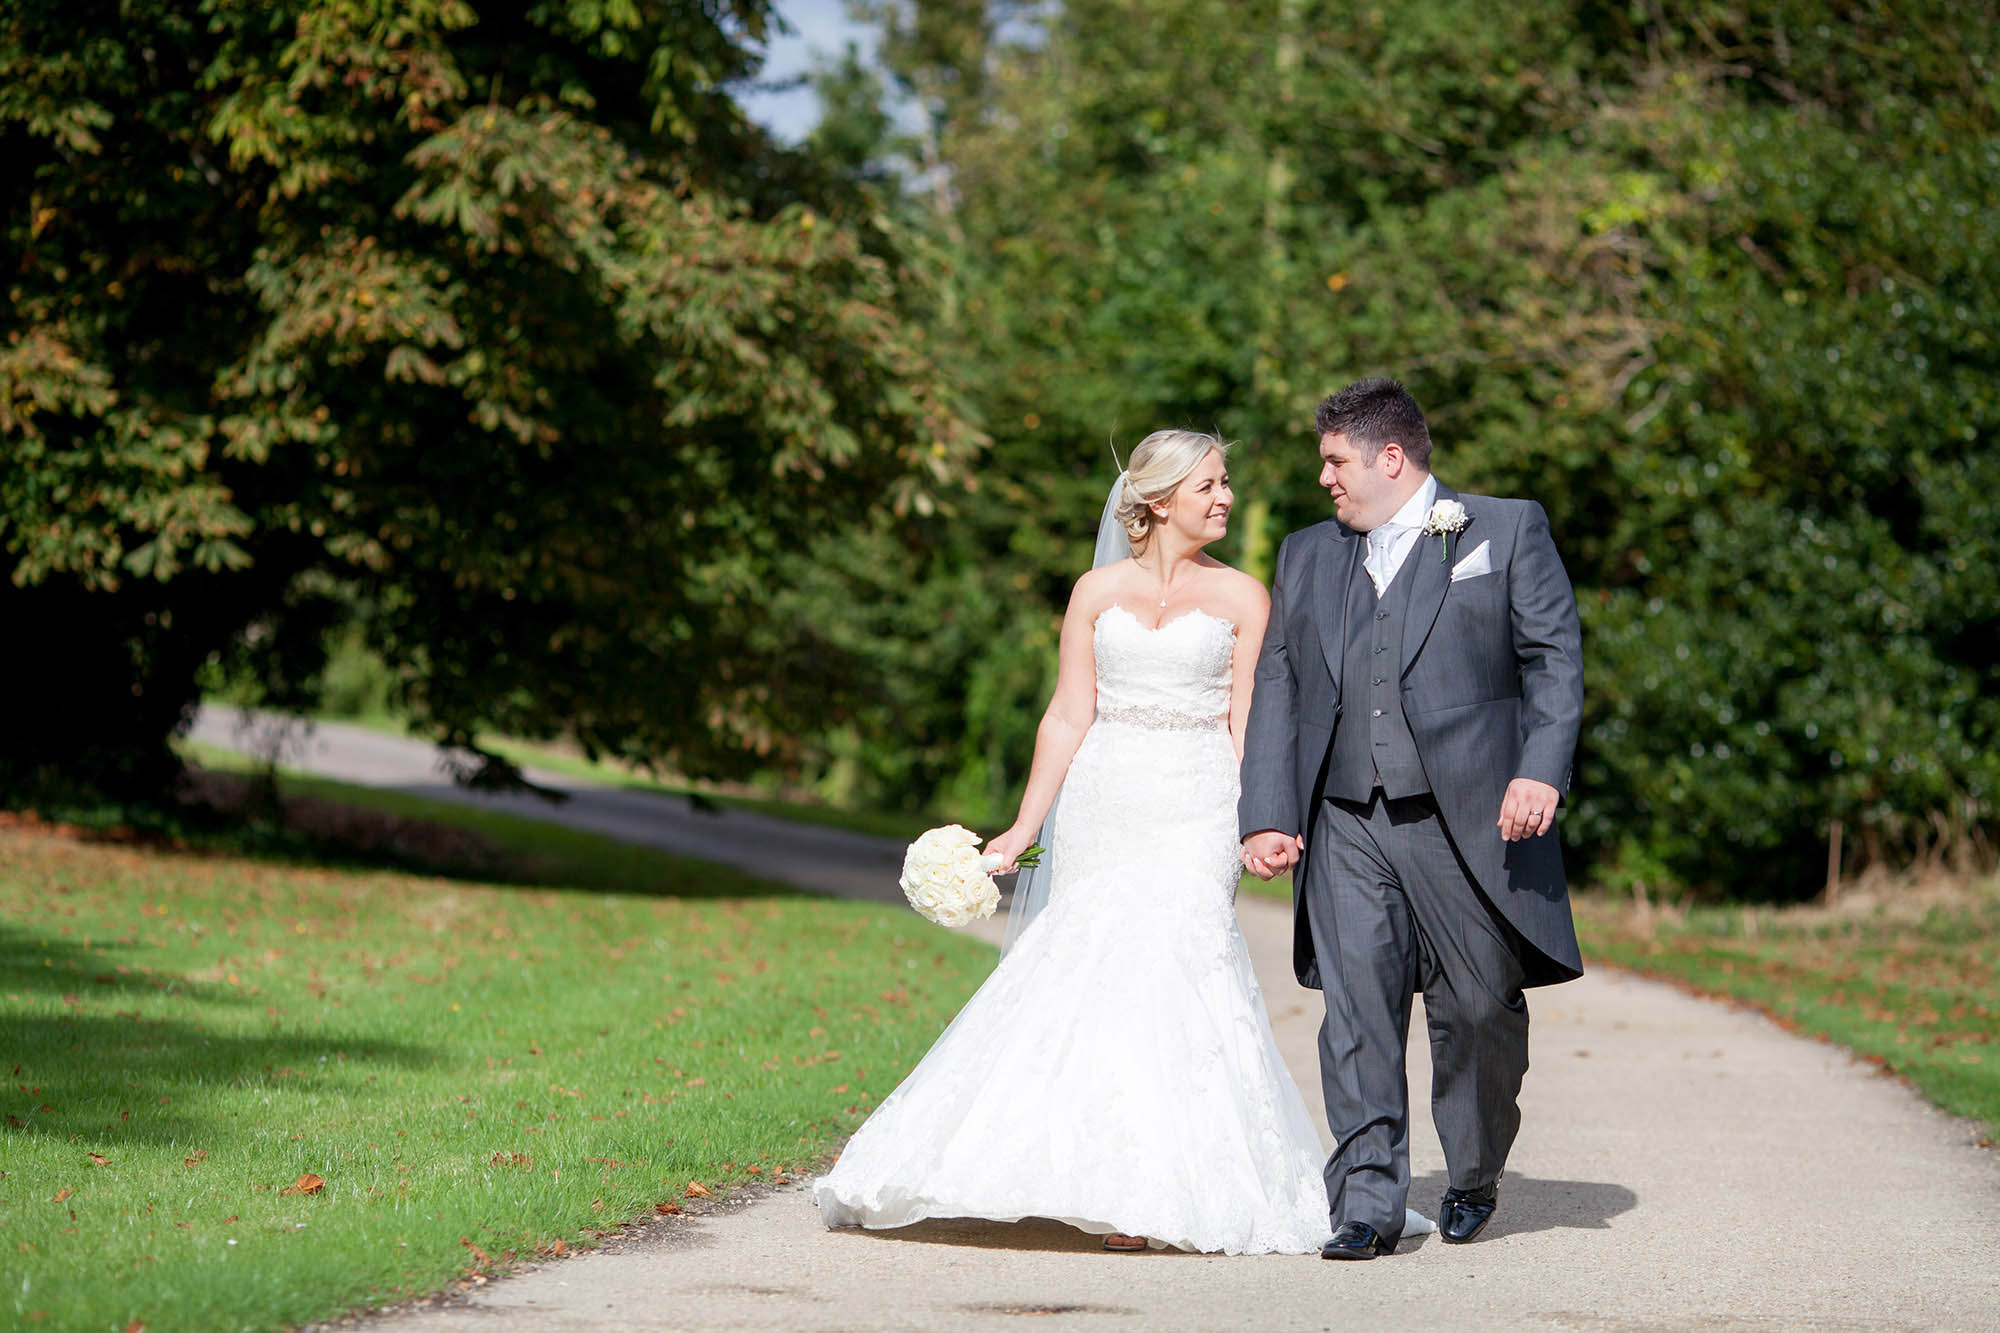 julia-toms-wedding-photographer-west-sussex-013.jpg